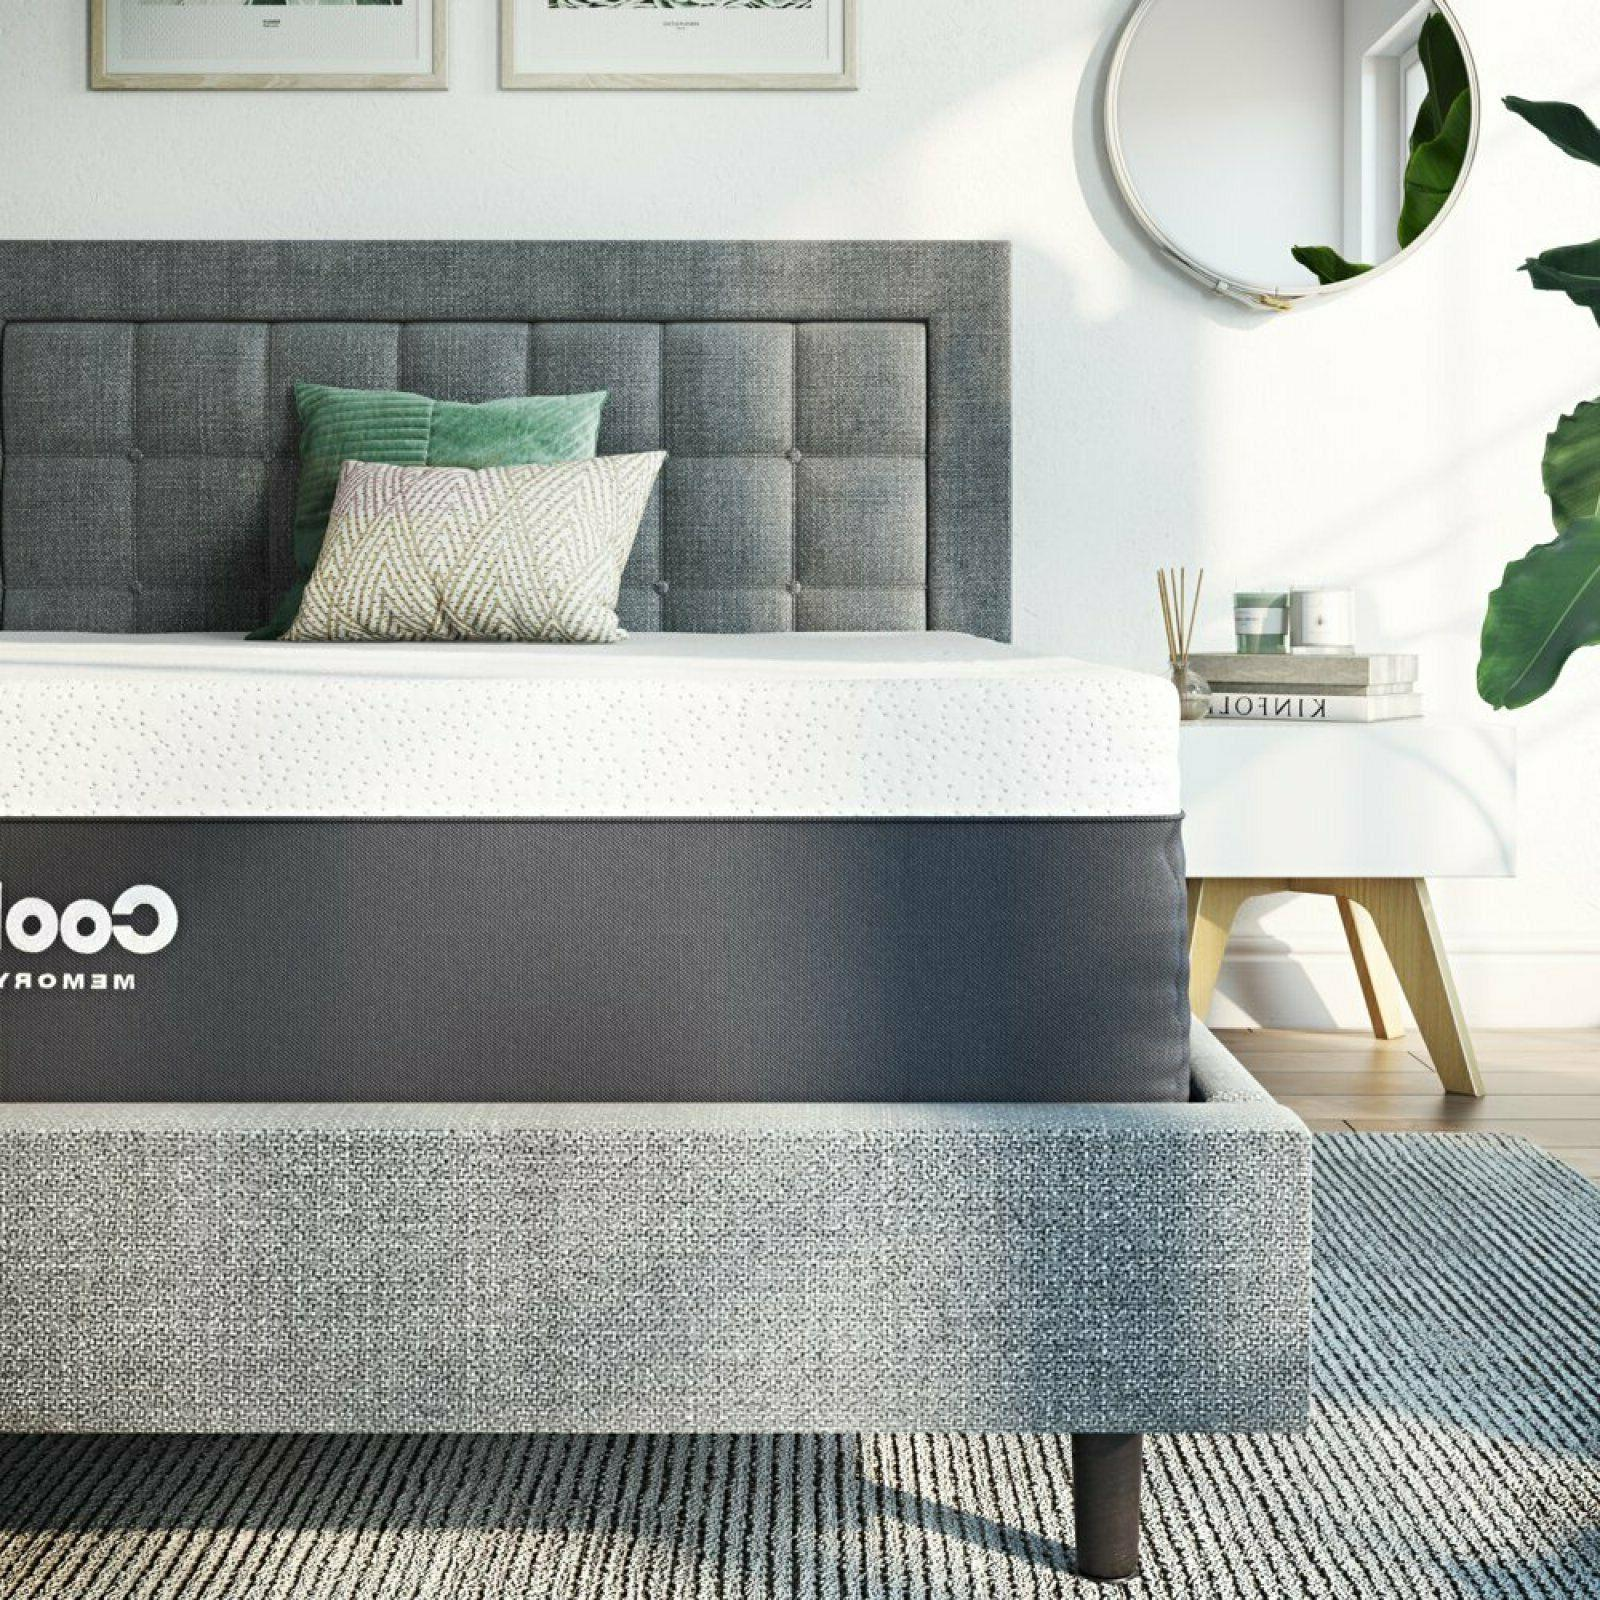 12 inch Cool Gel Memory Foam Plush Mattress Medium Firm Bed